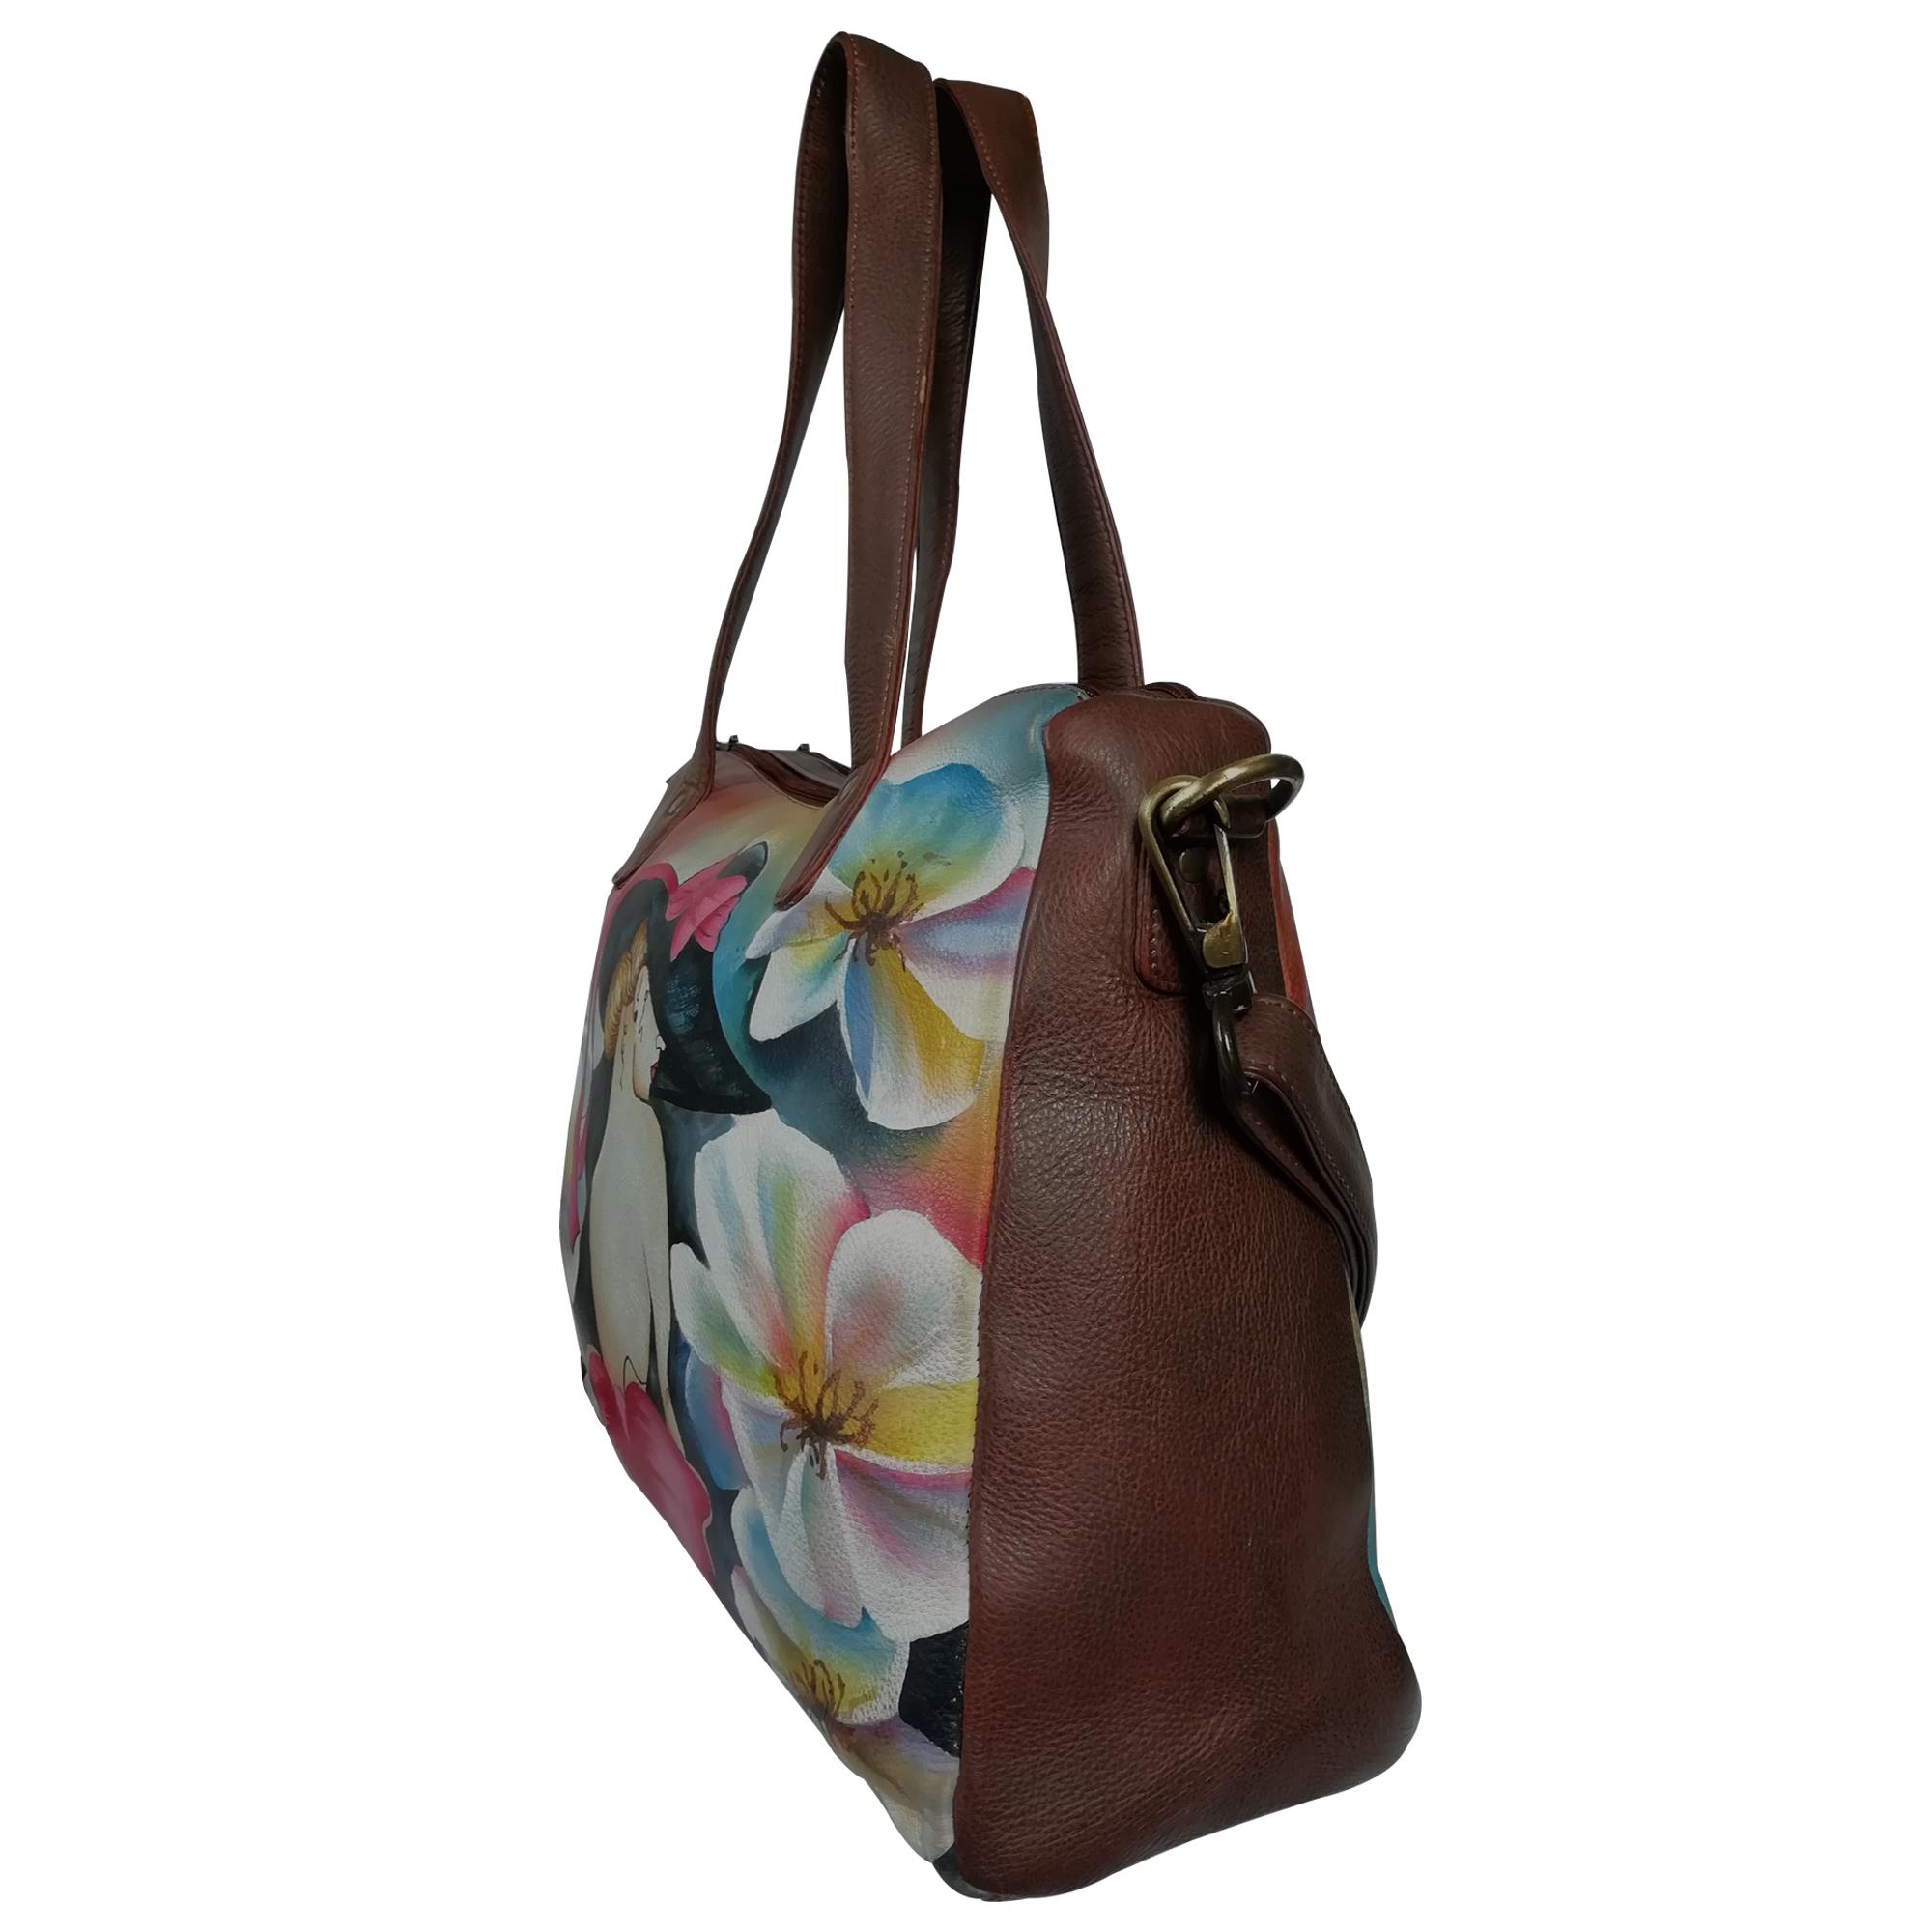 New Hand Painted Women Leather Shoulder Handbag